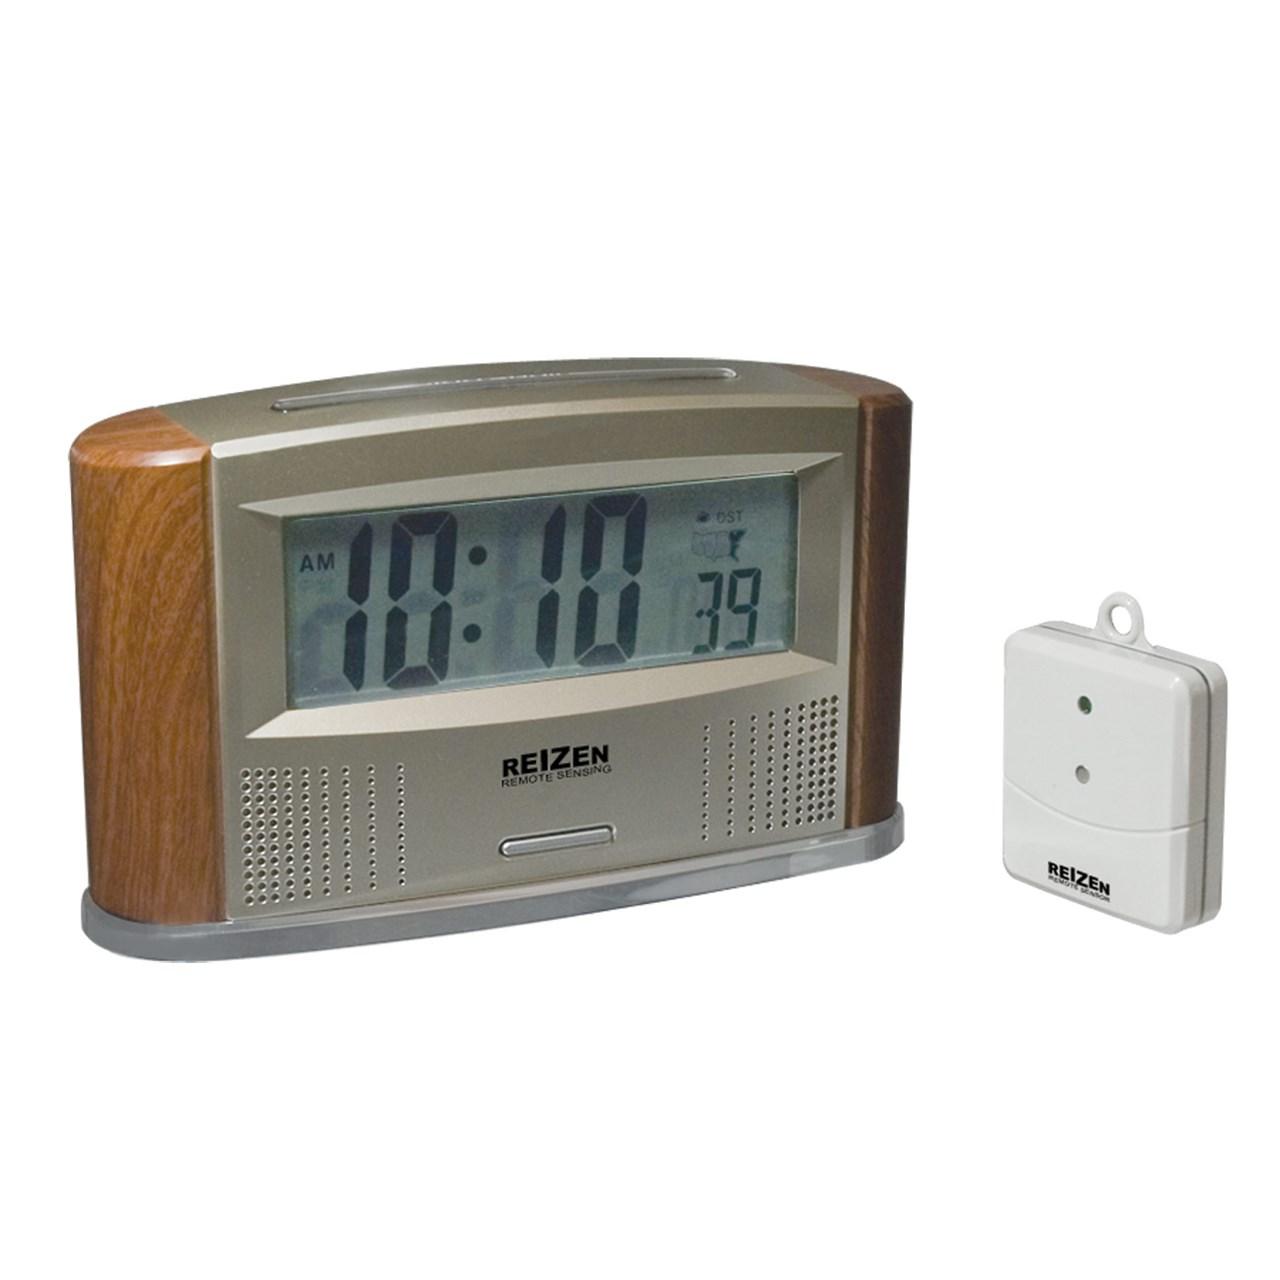 REIZEN Atomic Talking Clock with Indoor-Outdoor Thermometer